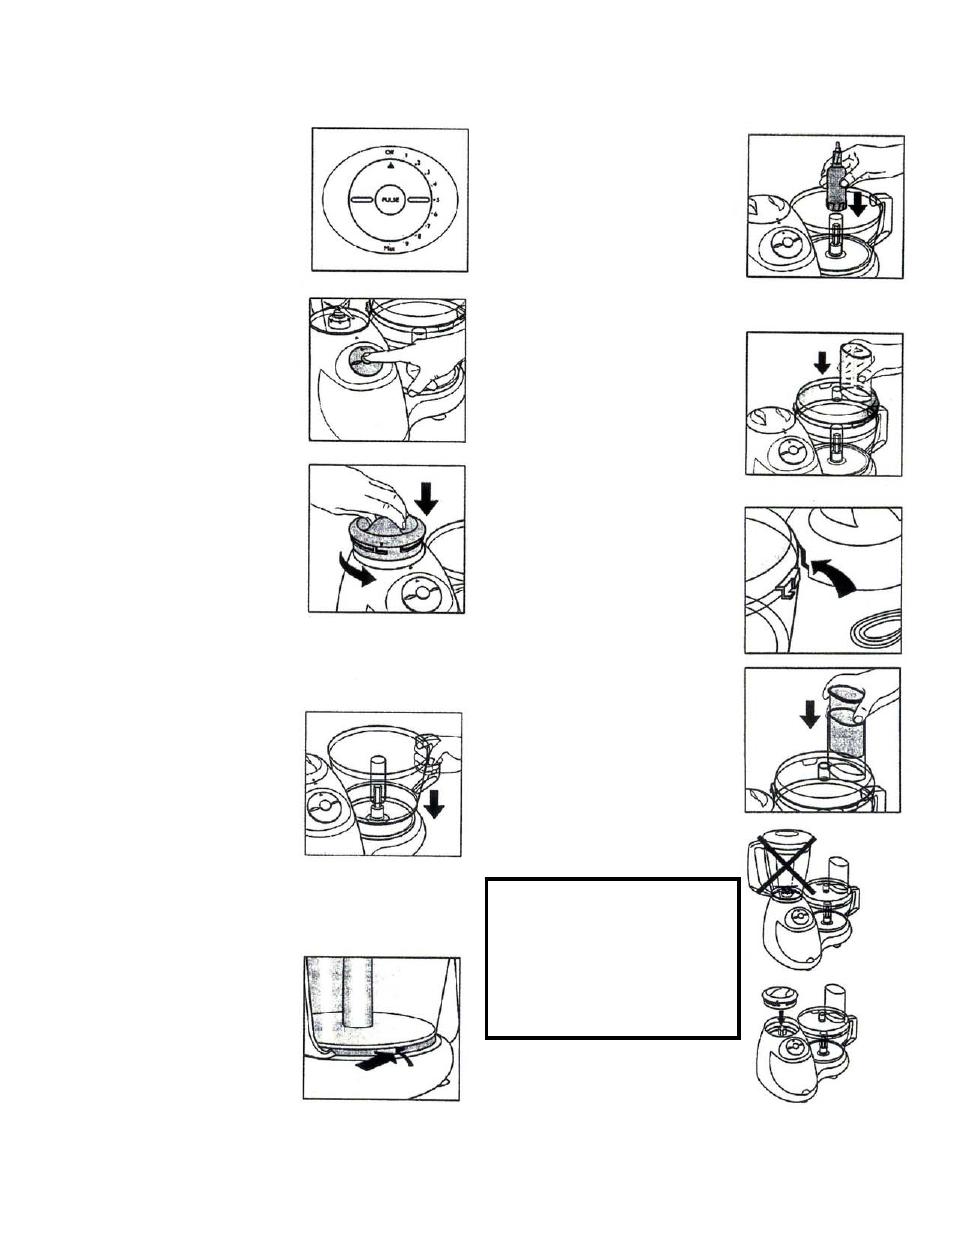 instructions for use bravetti food processor with blender bp100 rh manualsdir com kitchenaid artisan blender instruction manual osterizer blender instruction manual